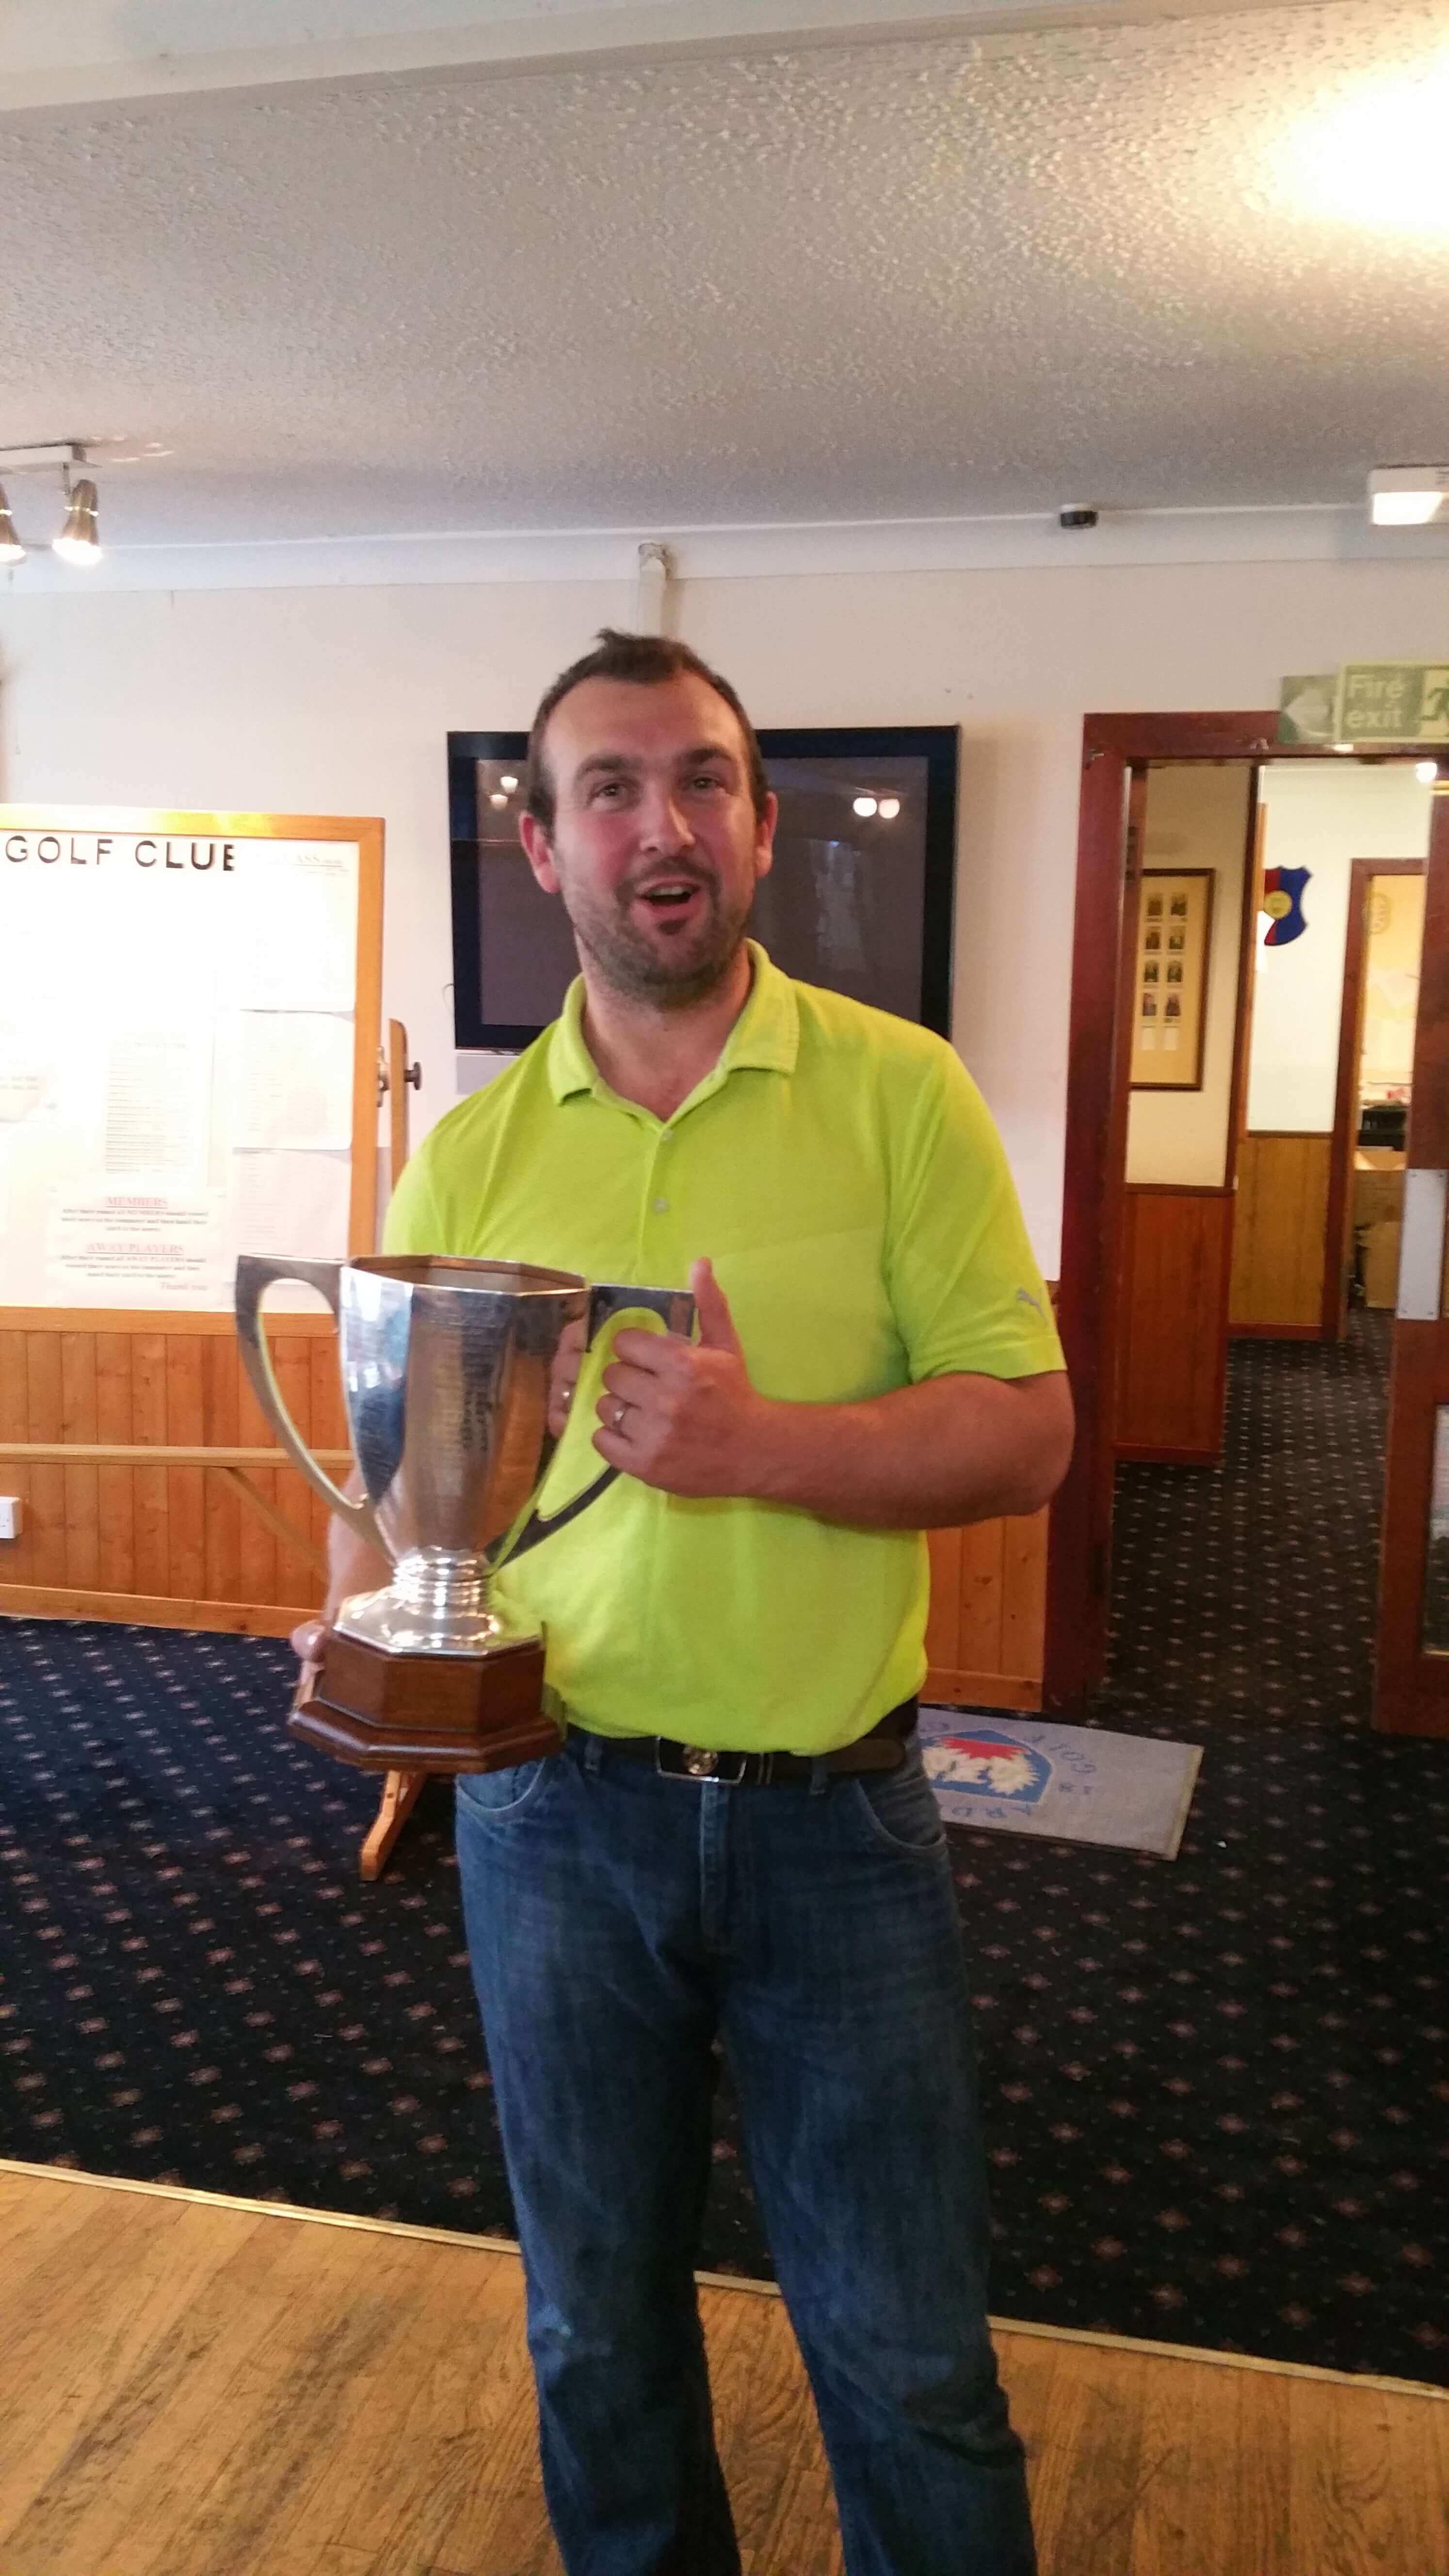 MacGilhrist Cup Winner 2018